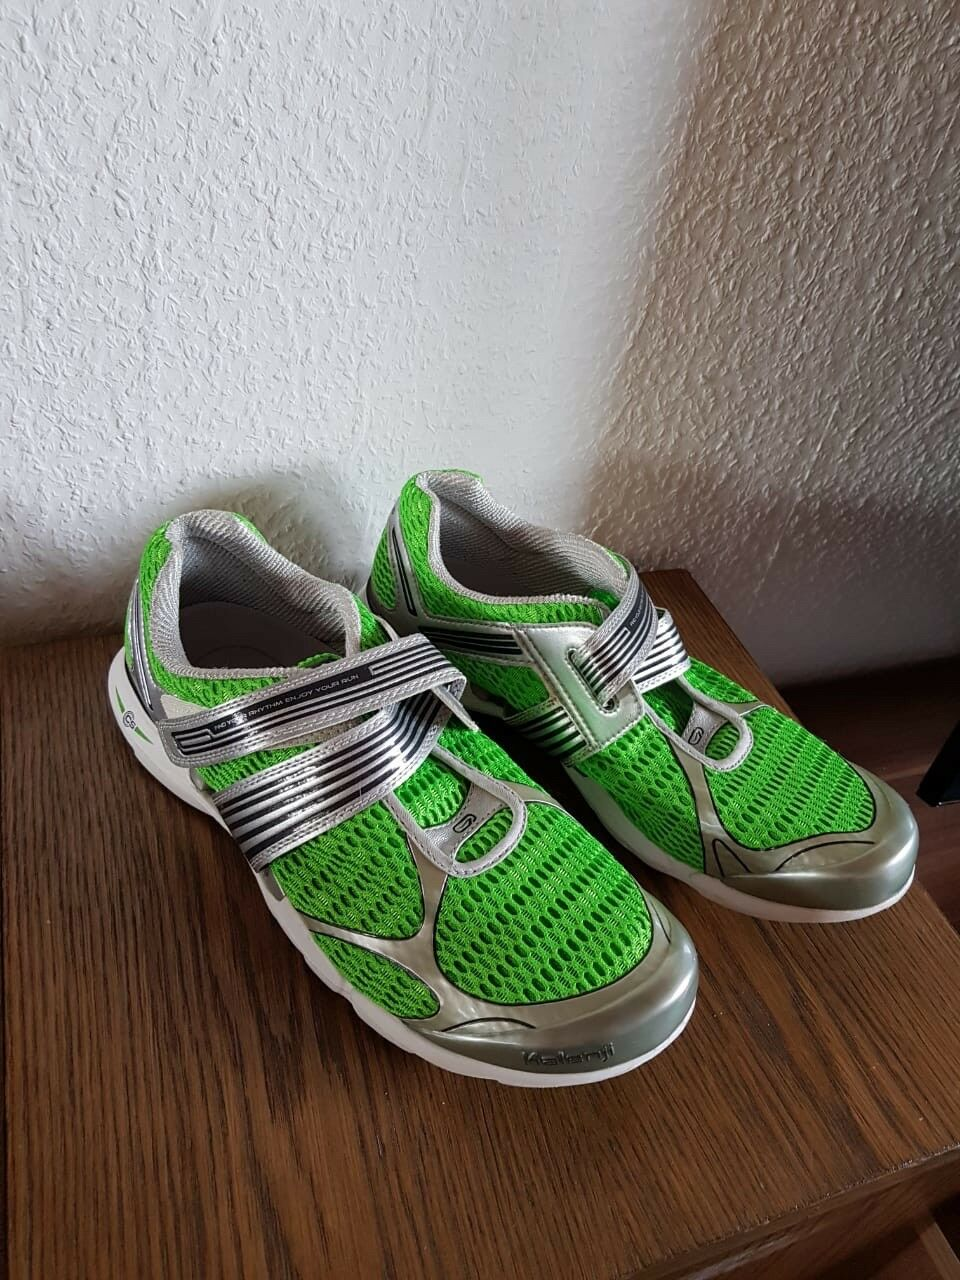 Billig Kalenji hohe Qualität Sportschuhe von Kalenji Billig Gr. 44,5 600a30